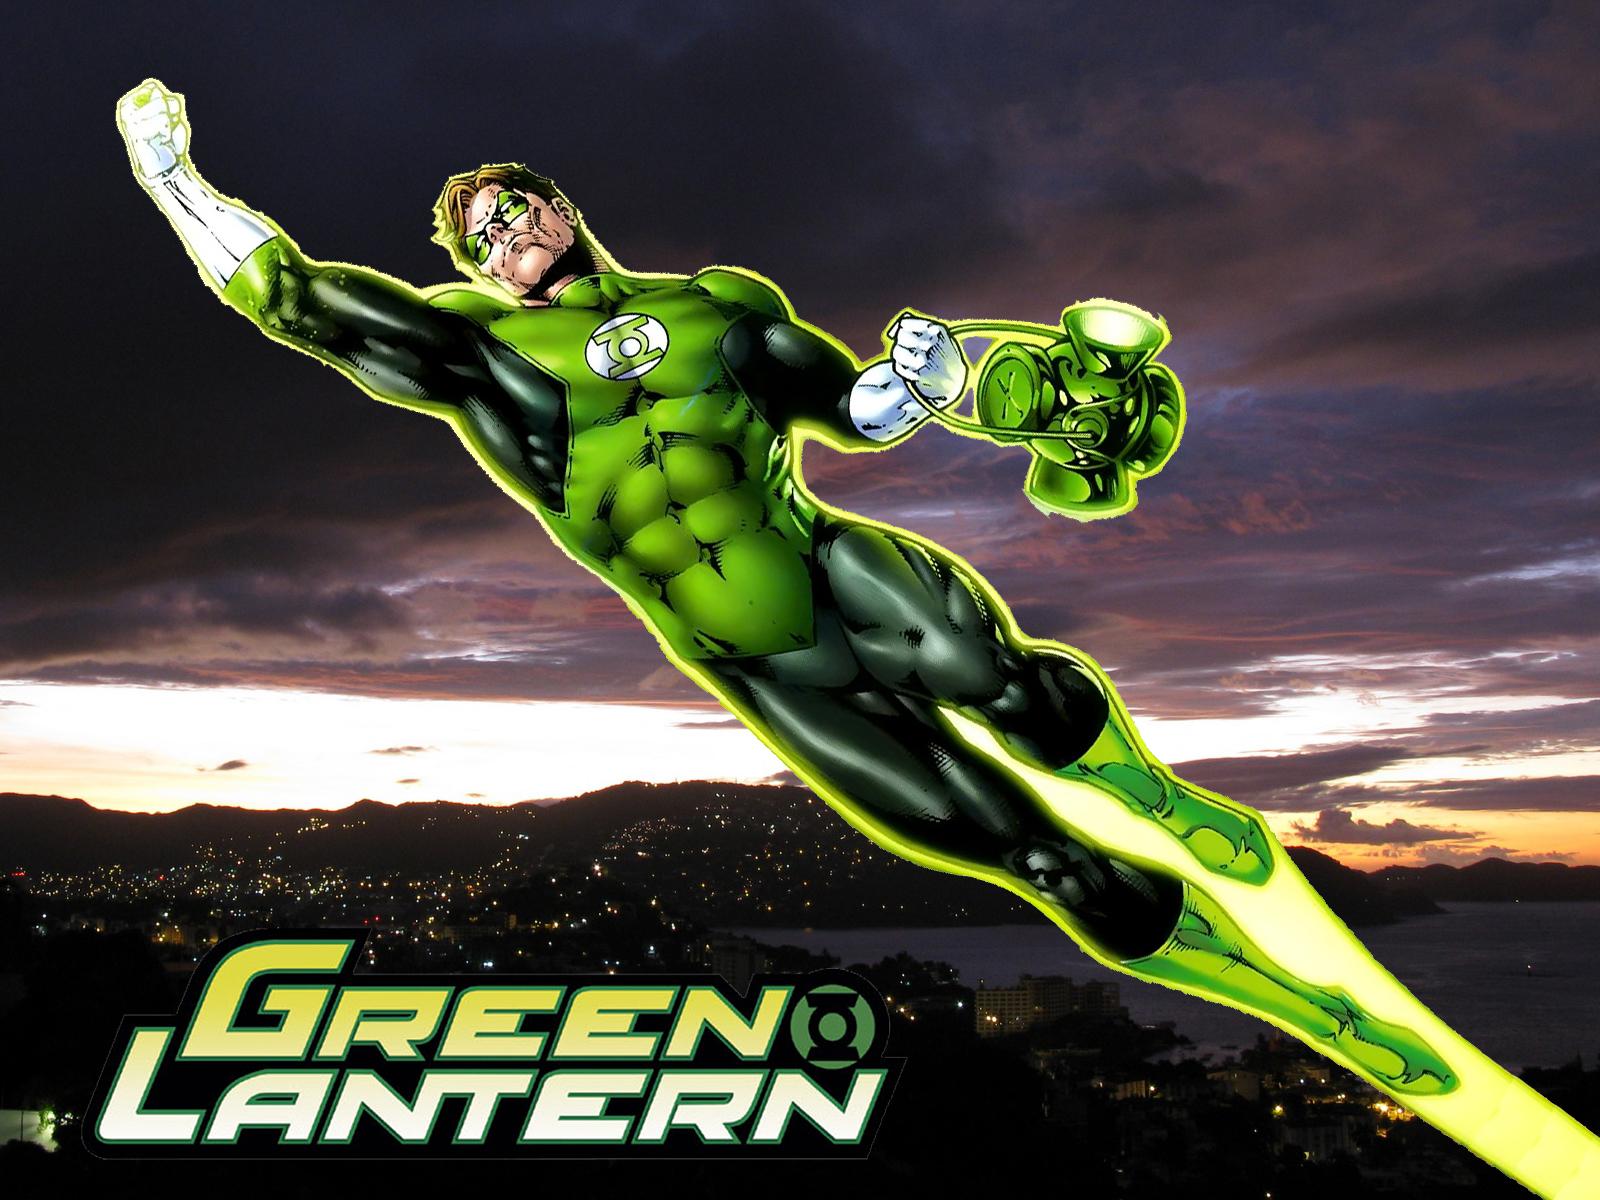 78] Green Lantern Desktop Wallpaper on WallpaperSafari 1600x1200